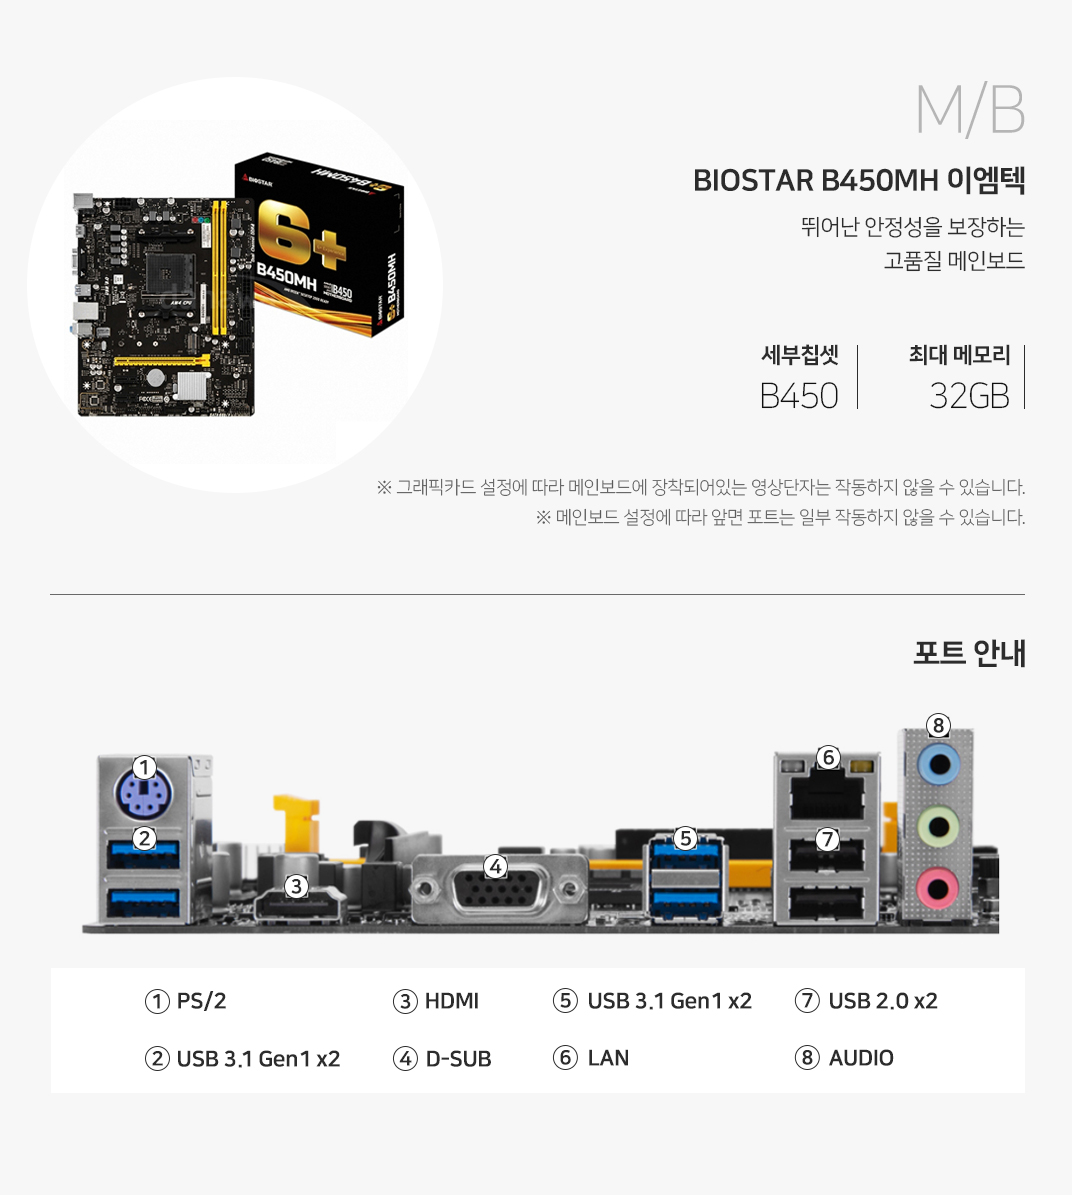 M/B BIOSTAR B450MH 이엠텍 뛰어난 안정성을 보장하는 고품질 메인보드 세부칩셋 B450 최대메모리 32GB 그래픽 설정에 따라 메인보드에 장착되어 있는 영상단자는 작동하지 않을 수 있습니다. 메인보드 설정에 따라 앞면 포트는 일부 작동하지 않을 수 있습니다.